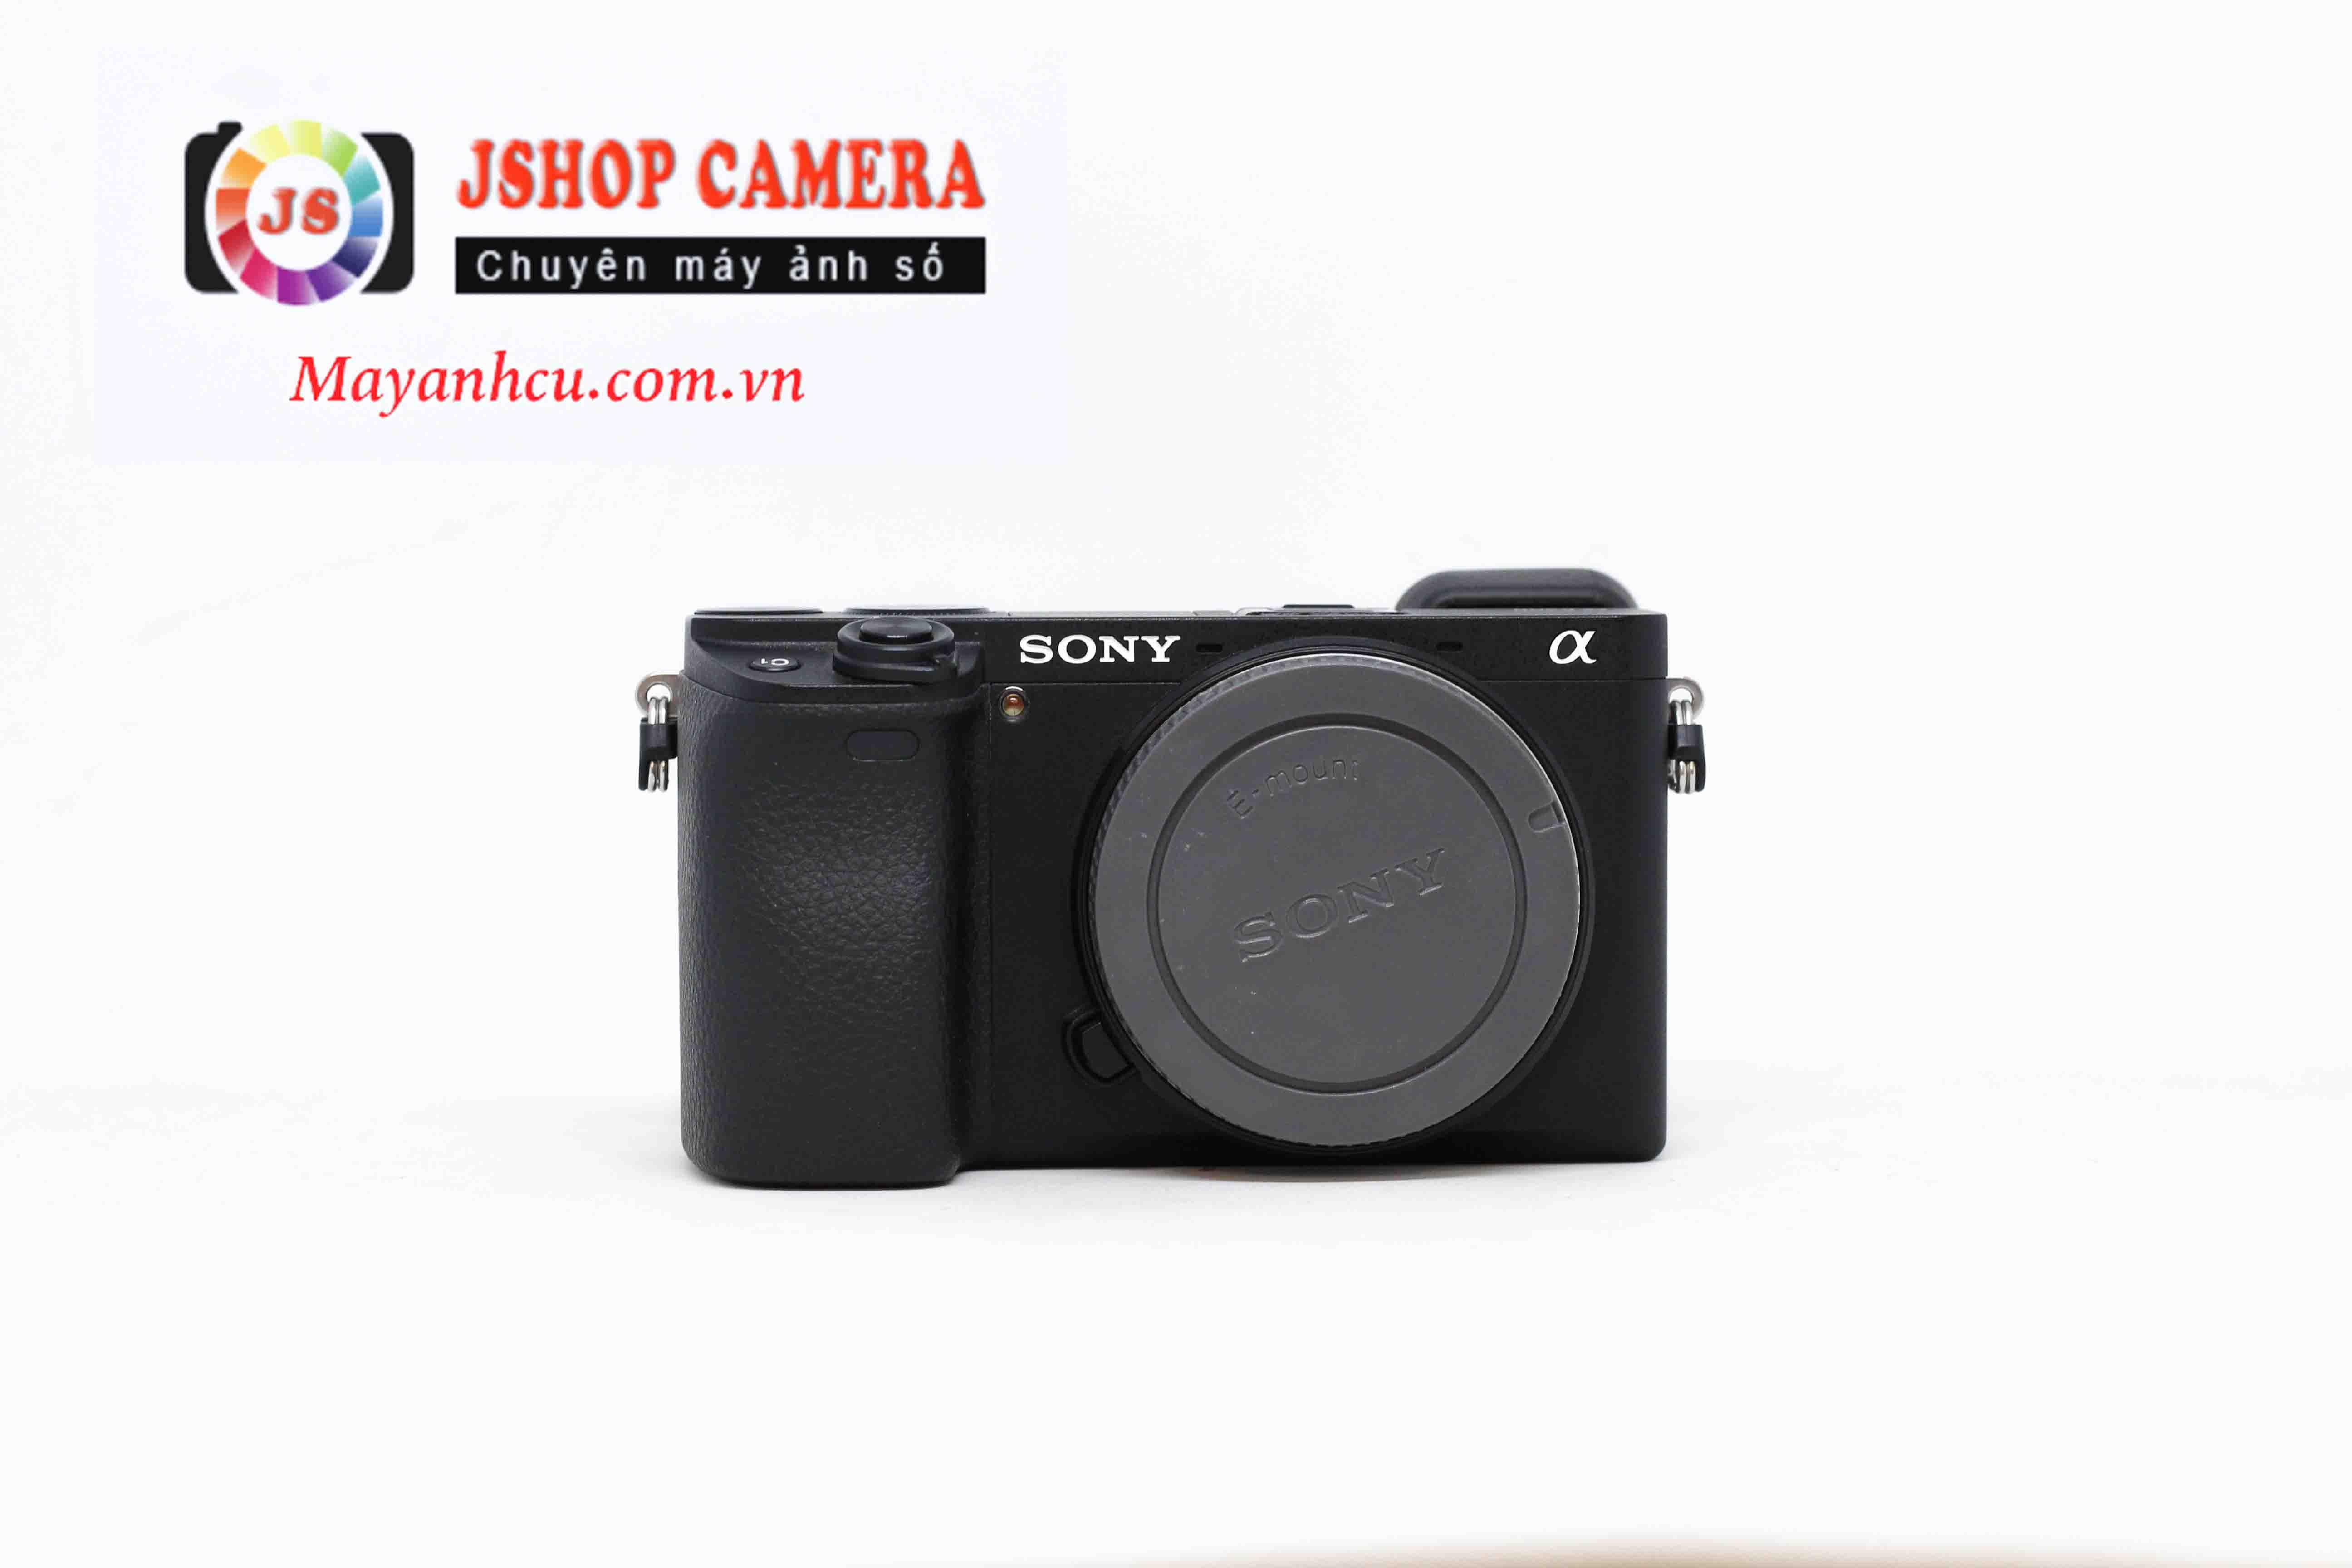 Máy ảnh Sony Alpha A6300 (body) giá rẻ